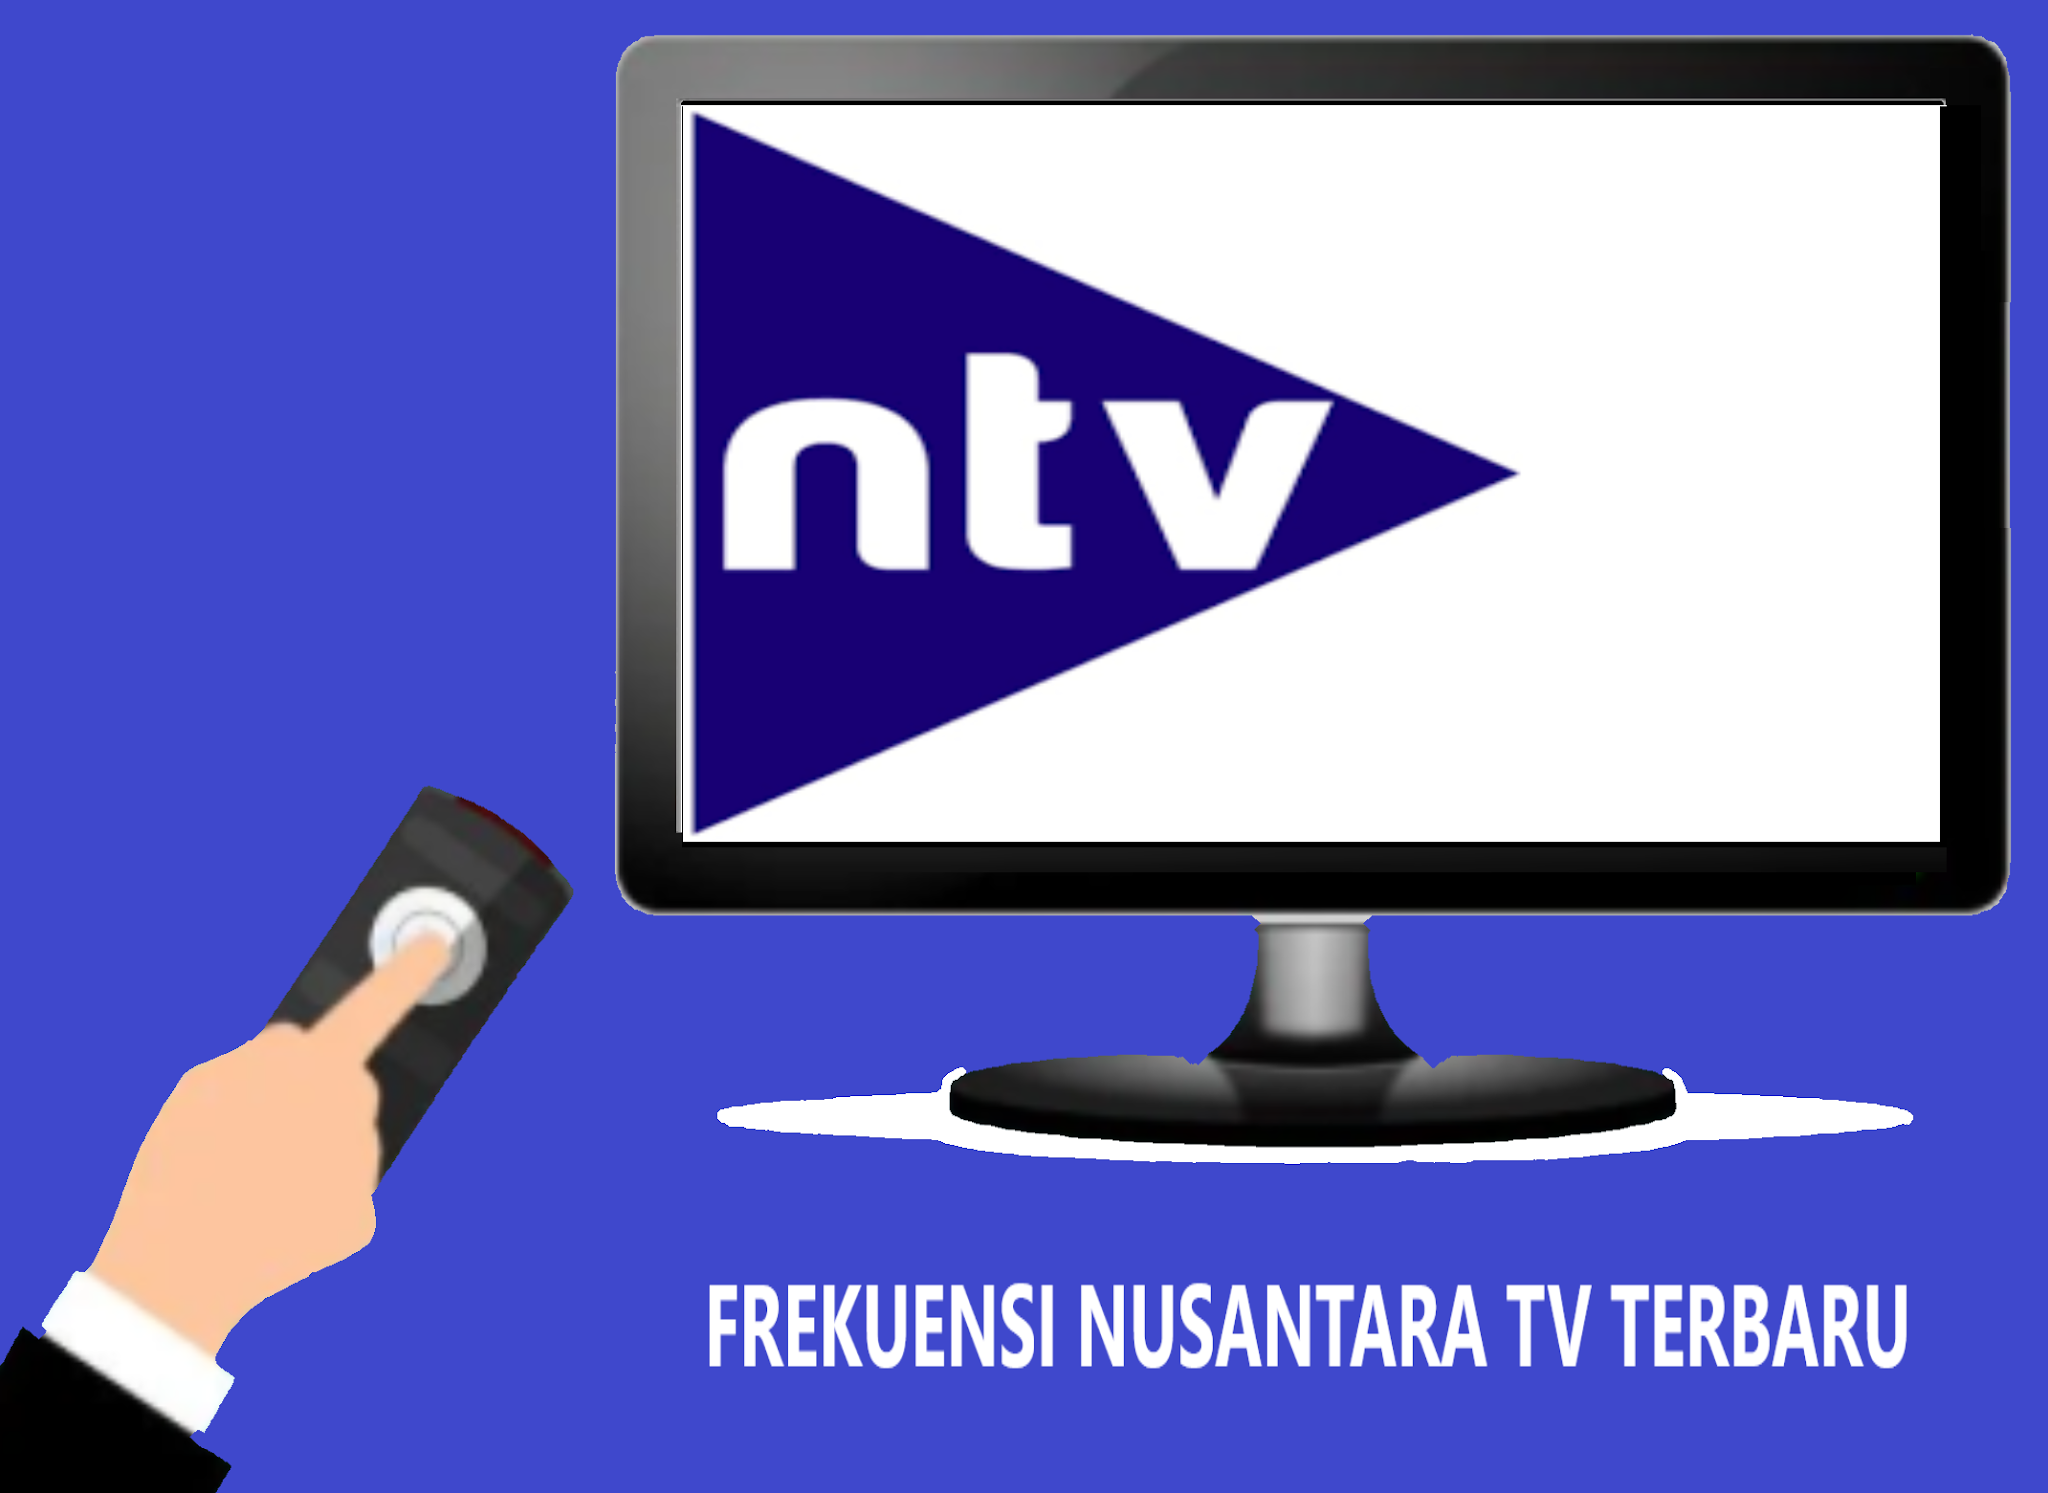 Frekuensi Nusantara TV Terbaru Di Telkom 4 Update 2020